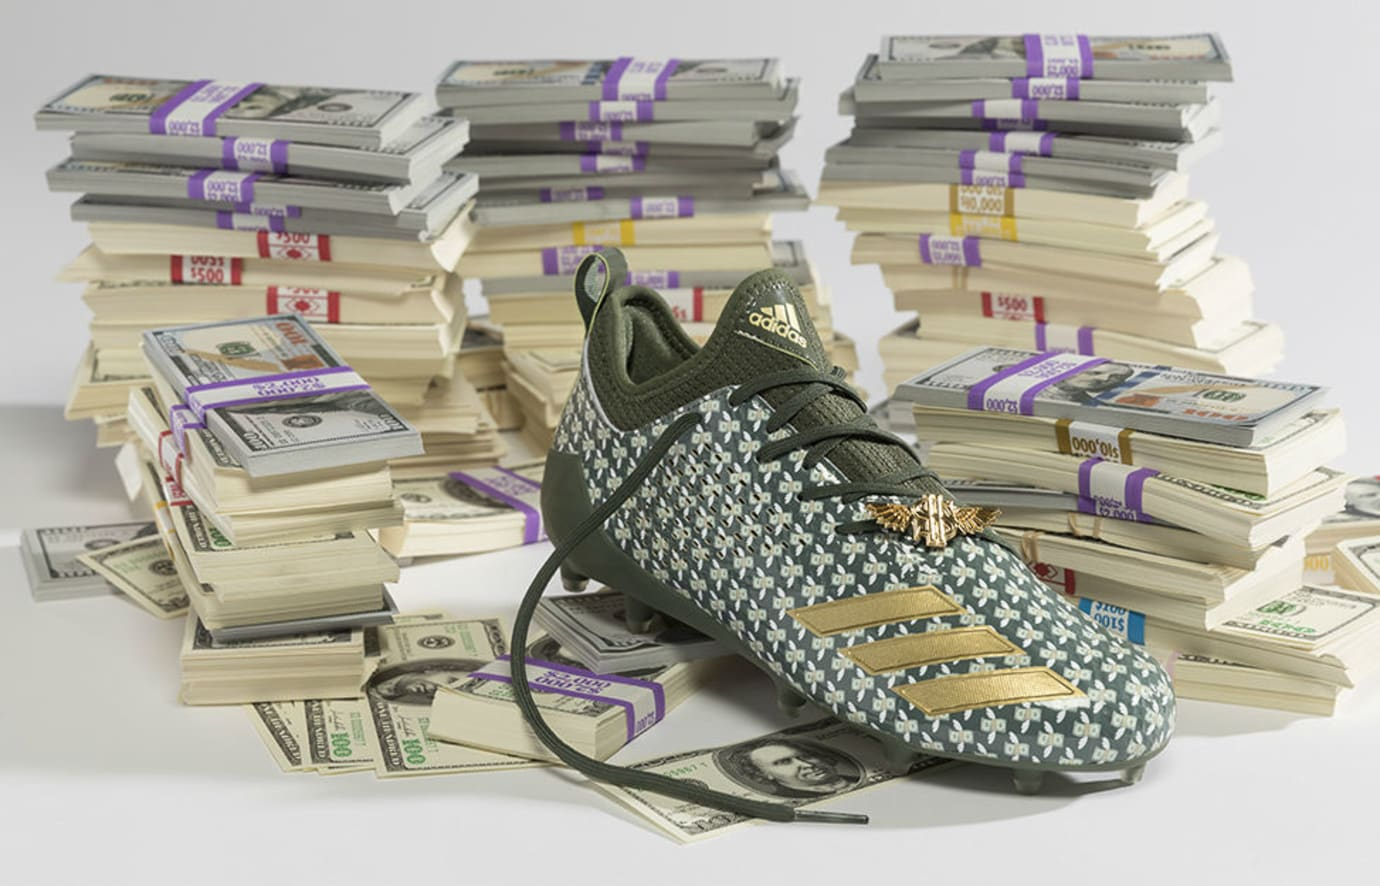 Adidas Adizero 5-Star 7.0 Emoji Cleats Money